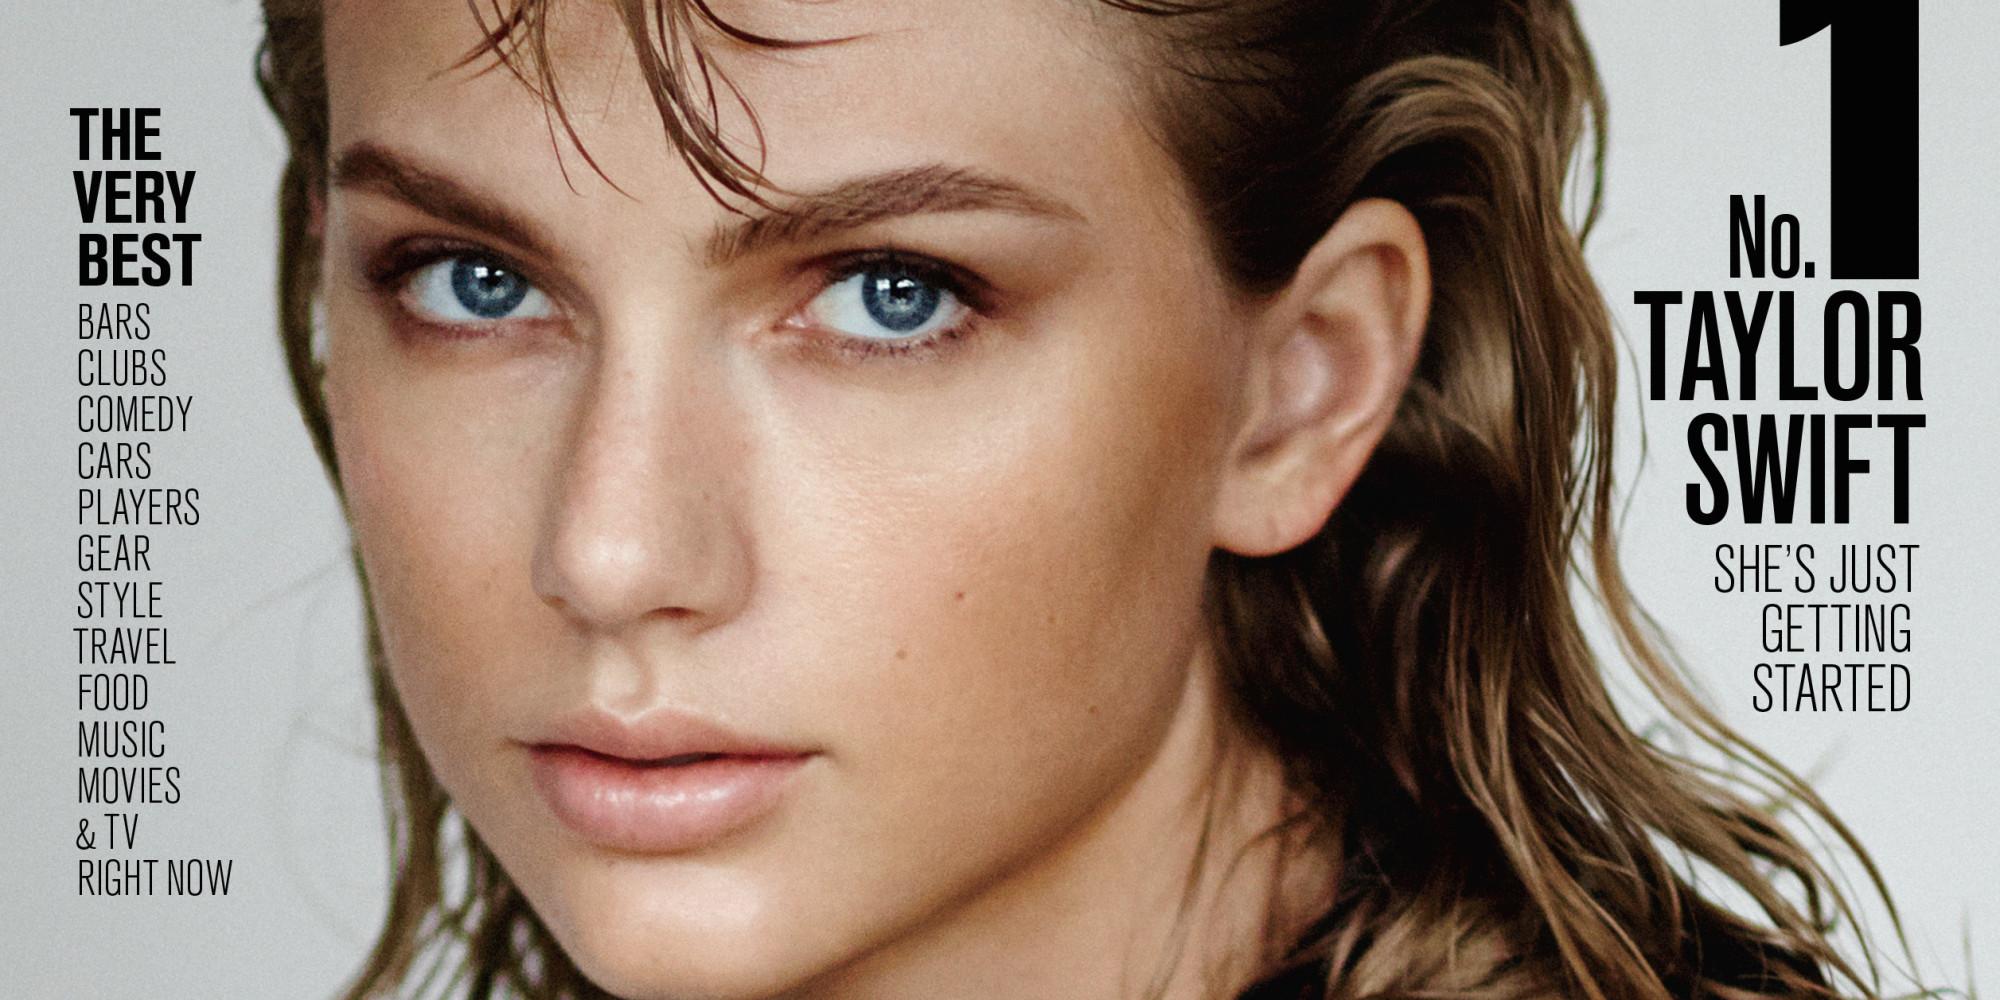 Taylor Swift Tops Maxim's 2015 Hot List | HuffPost Taylor Swift